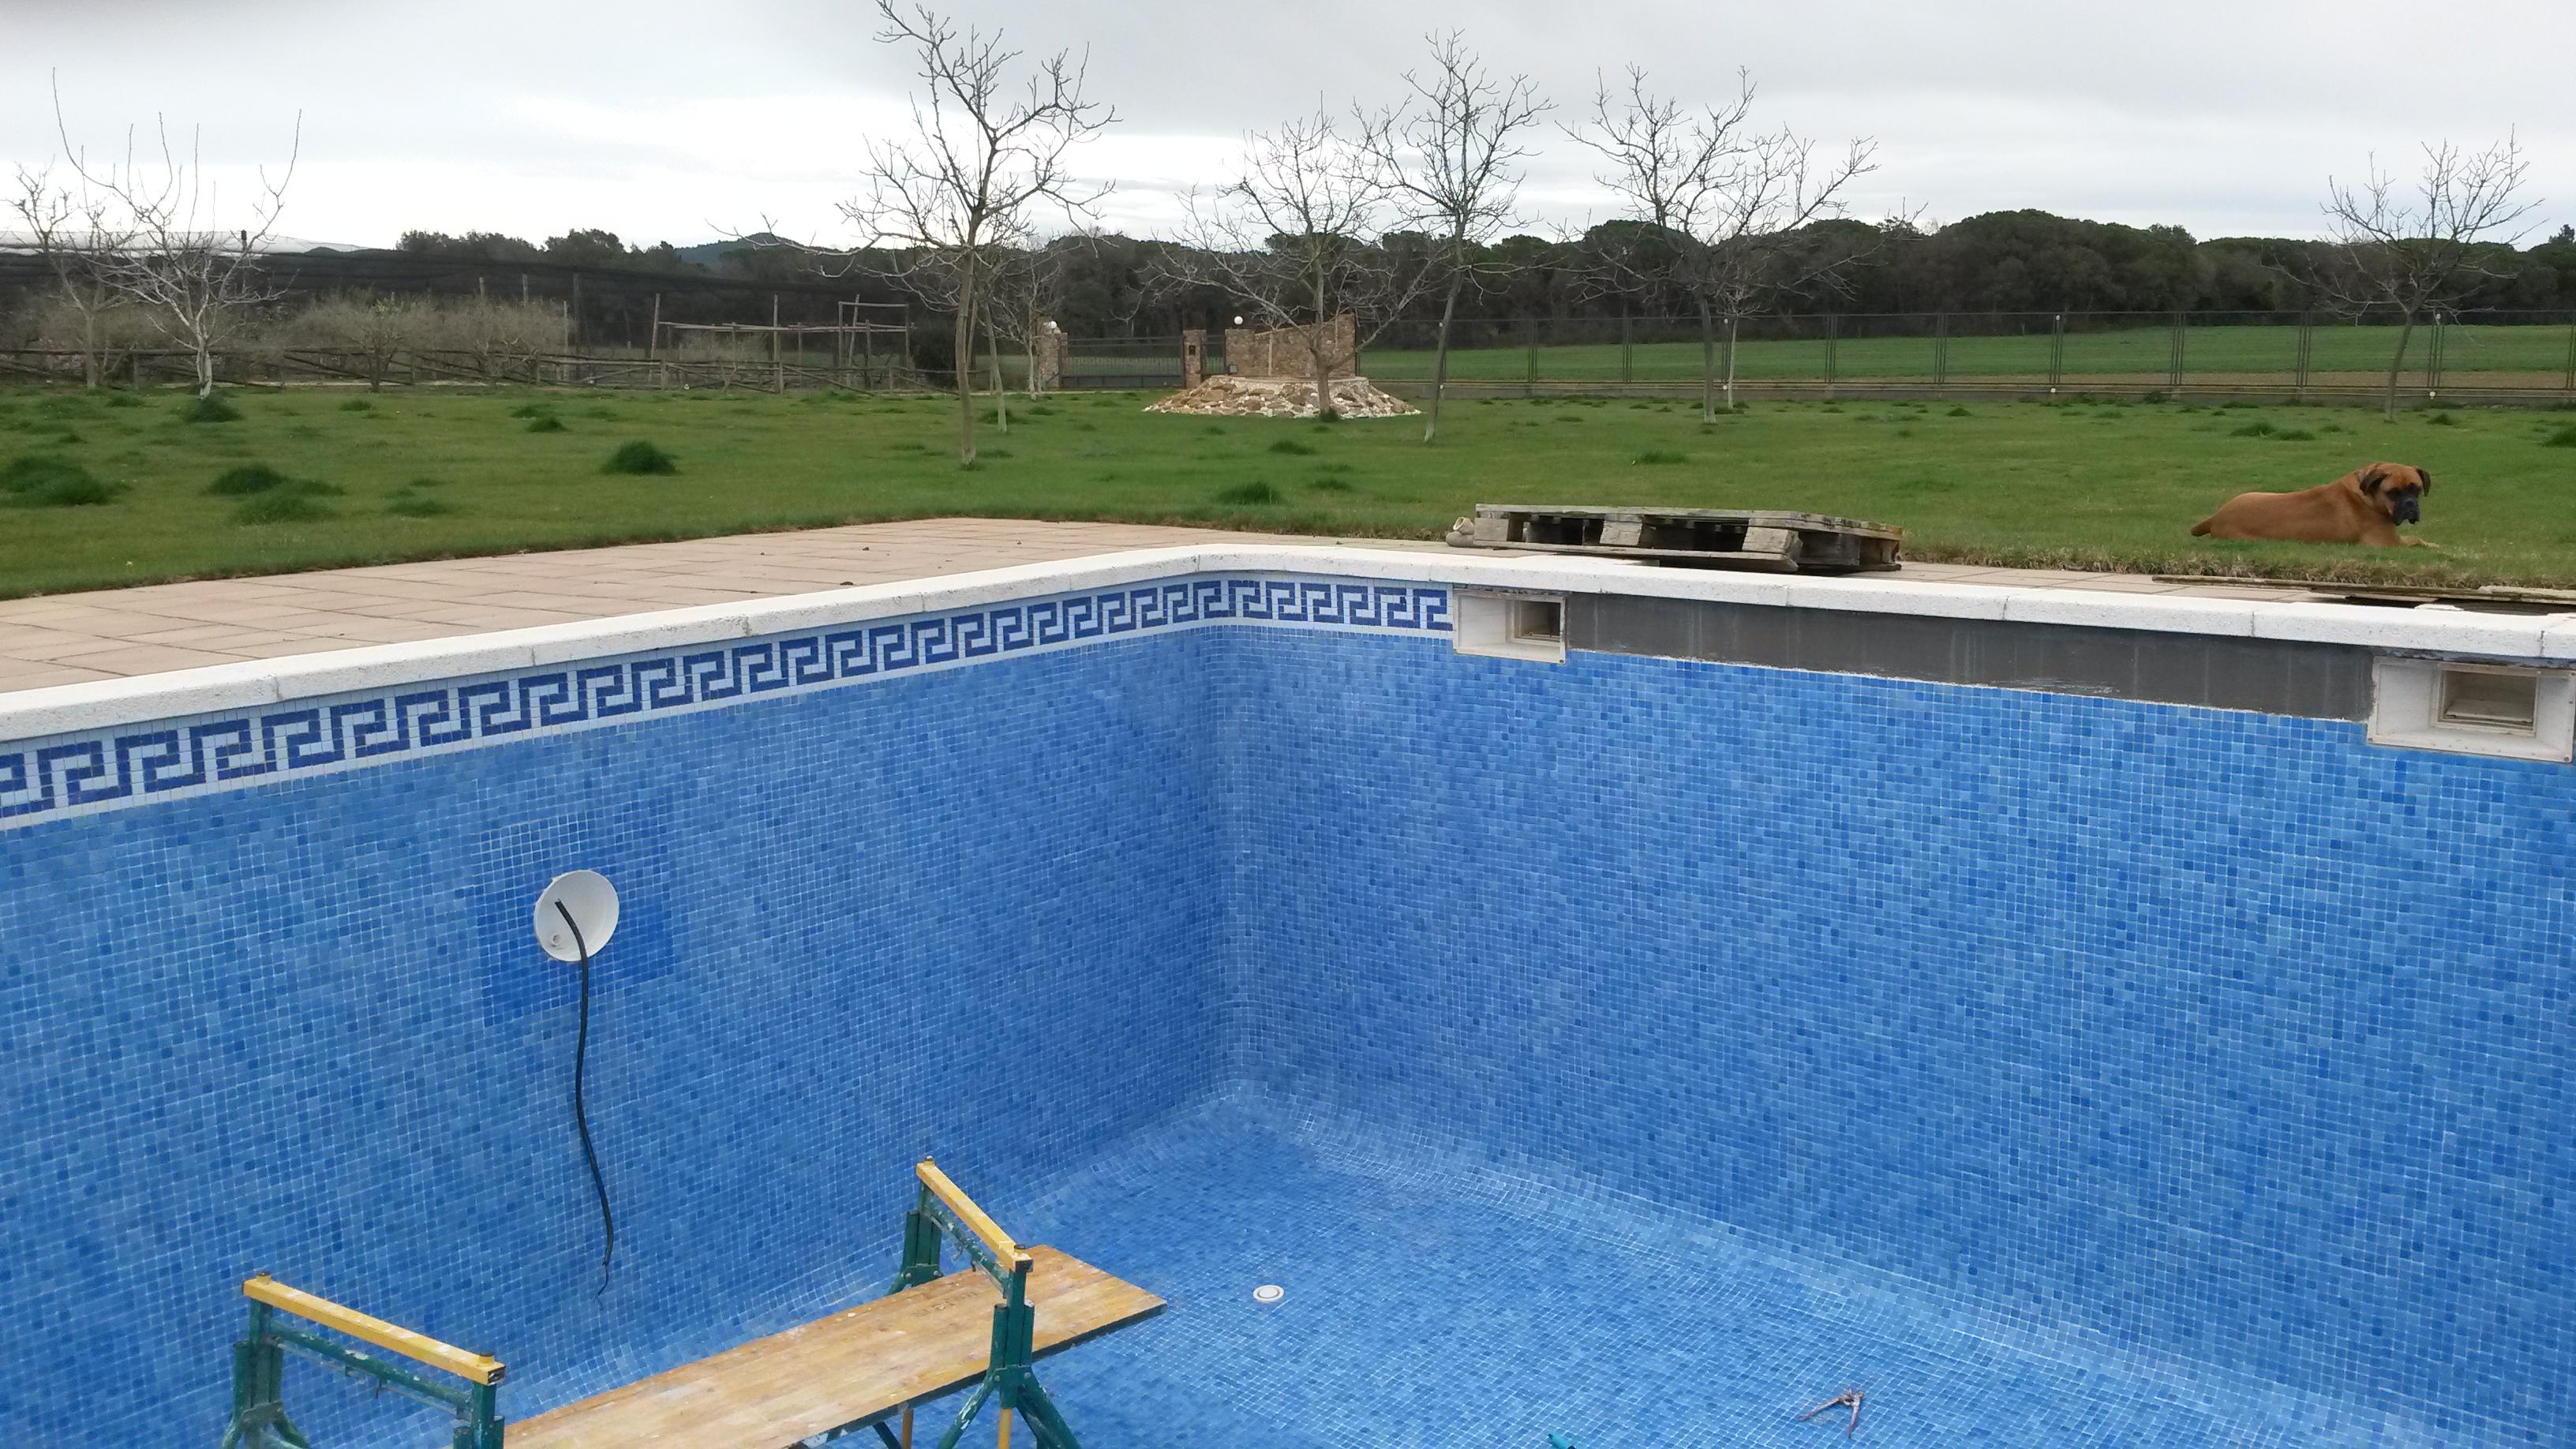 Reparaci n de piscinas cenefa y corona piscines bravi s l for En la piscina